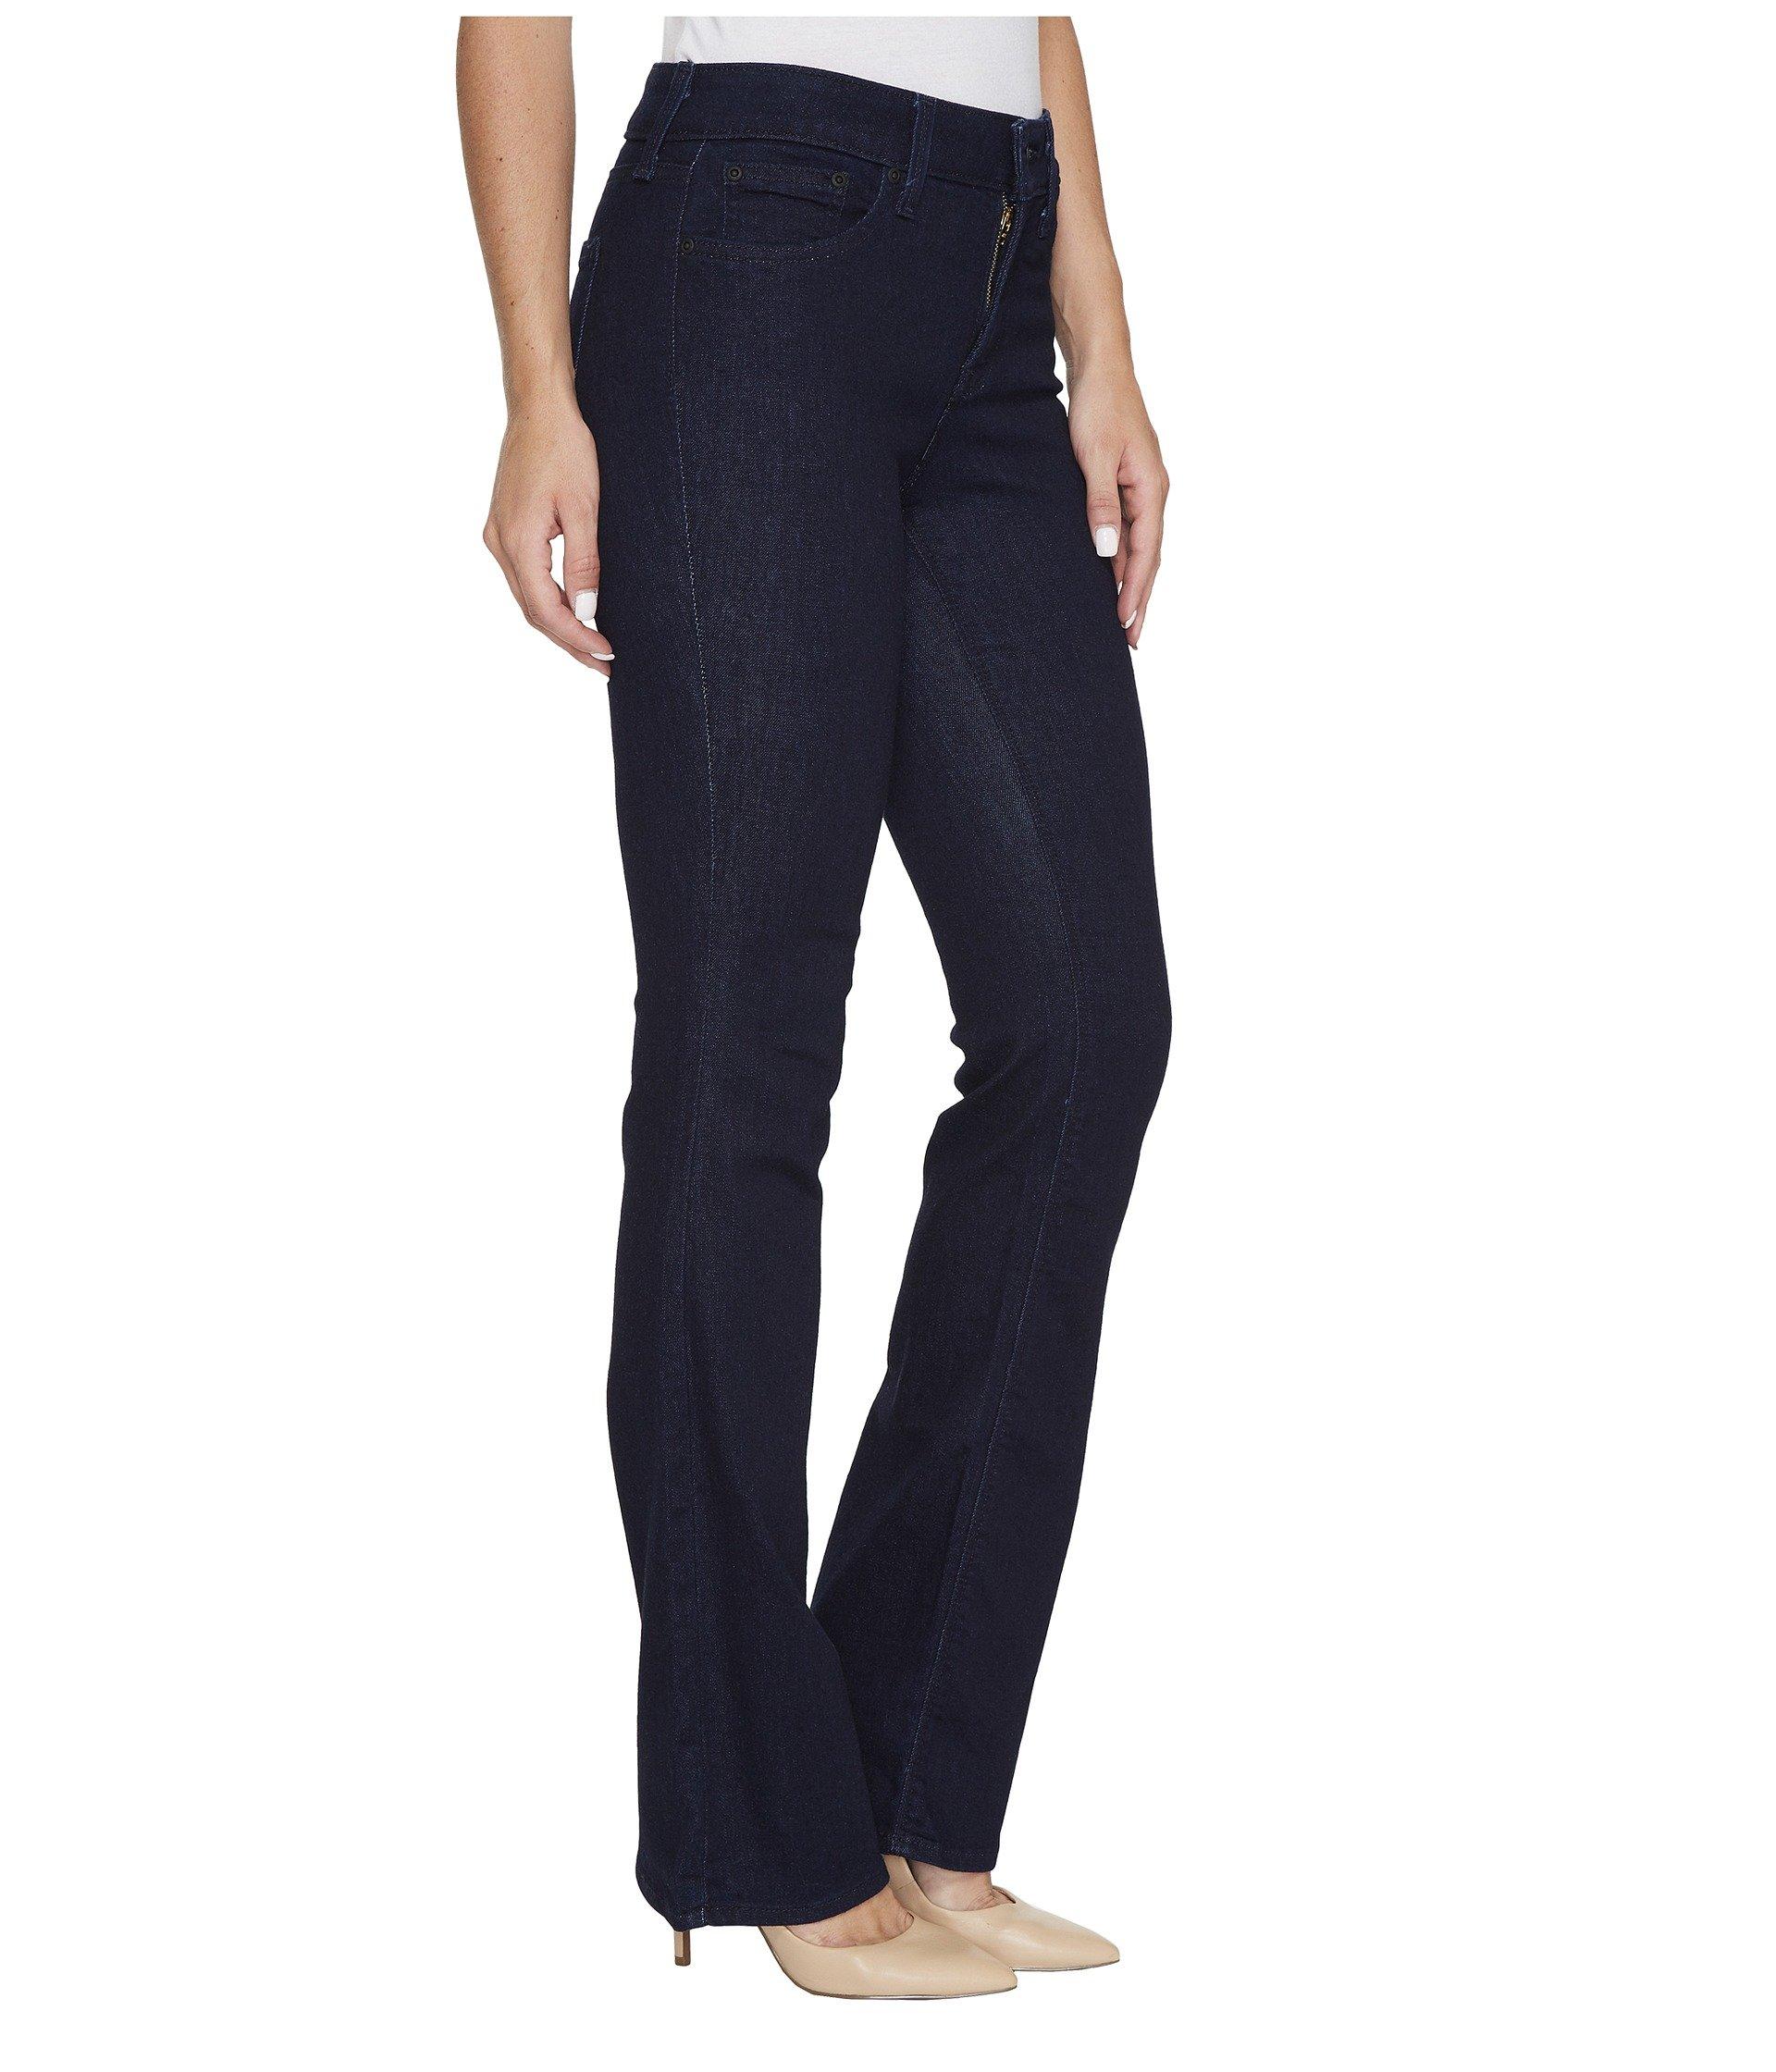 Best mini bootcut jeans